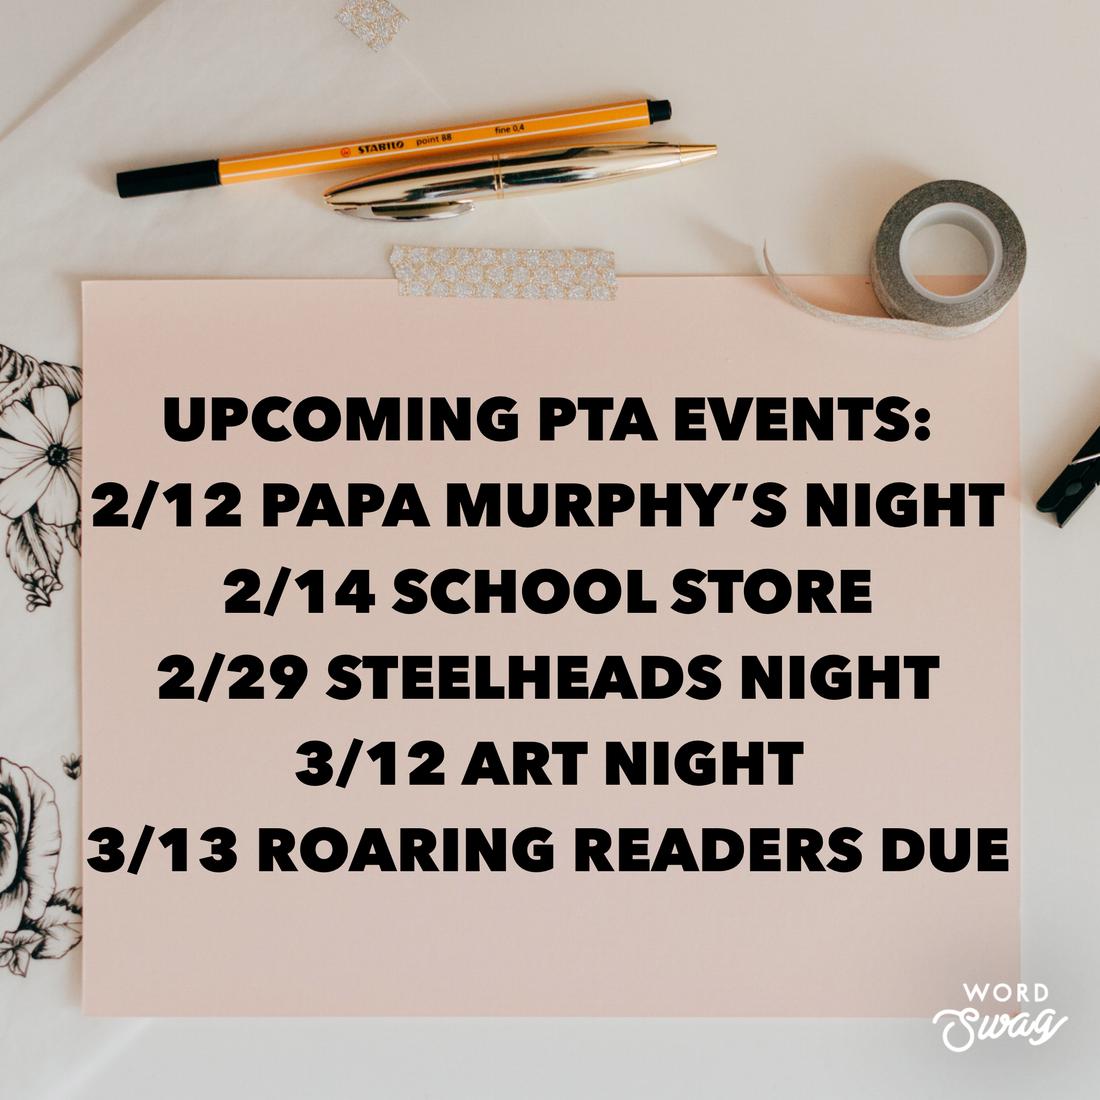 pen, pencil, tape-Upcoming PTA events: 2/12 papa murphy's night, 2/14 school store, 2/29 steelheads night, 3/12 art night, 3/13 roaring readers due